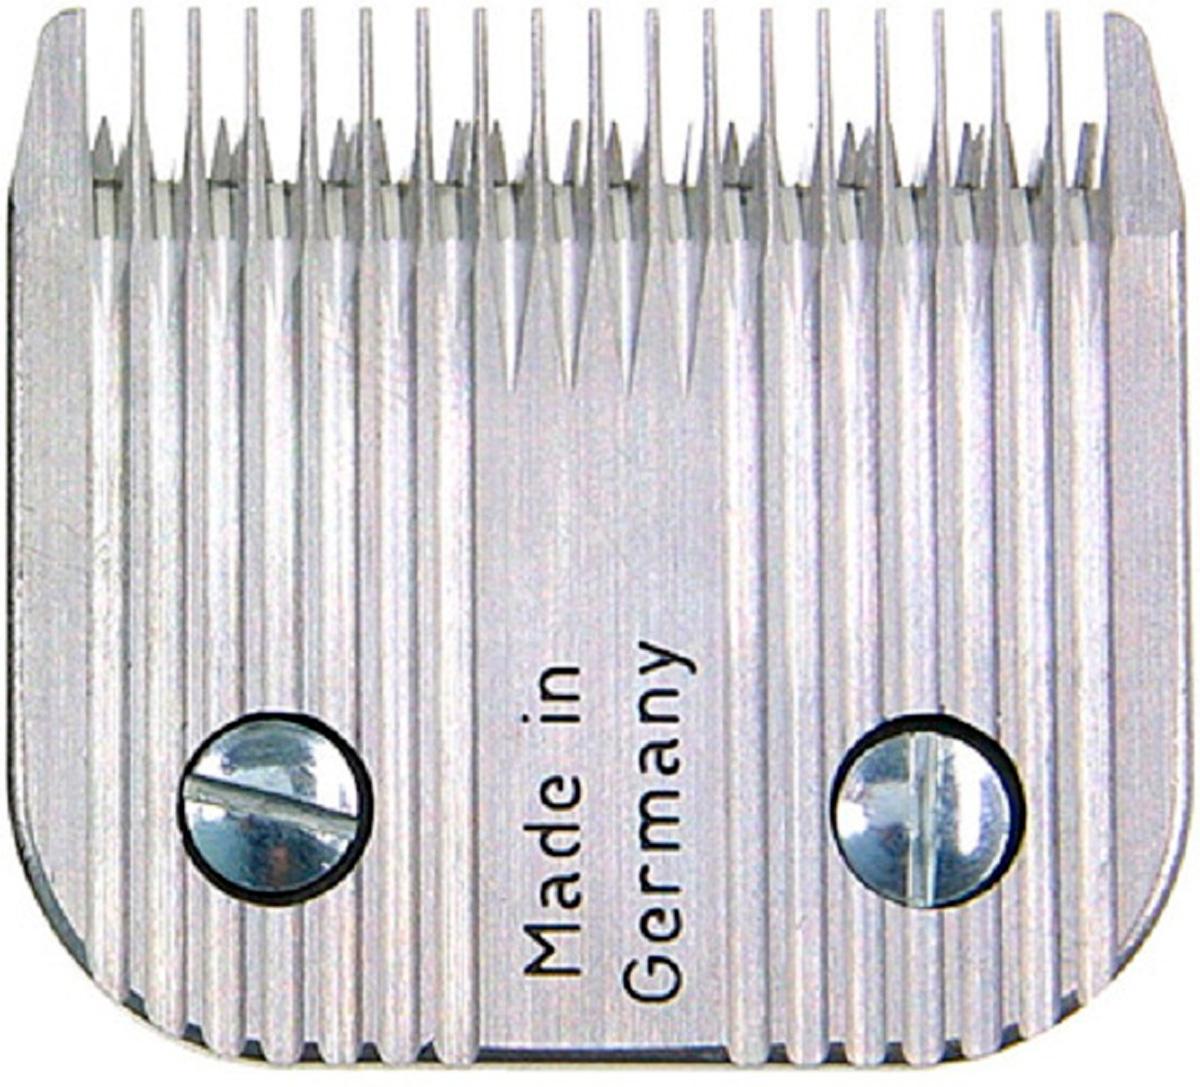 Moser 1245-7931 – Мозер съёмный нож 3,0 мм на машинки Moser 1245, Wahl 1247 (1 шт)